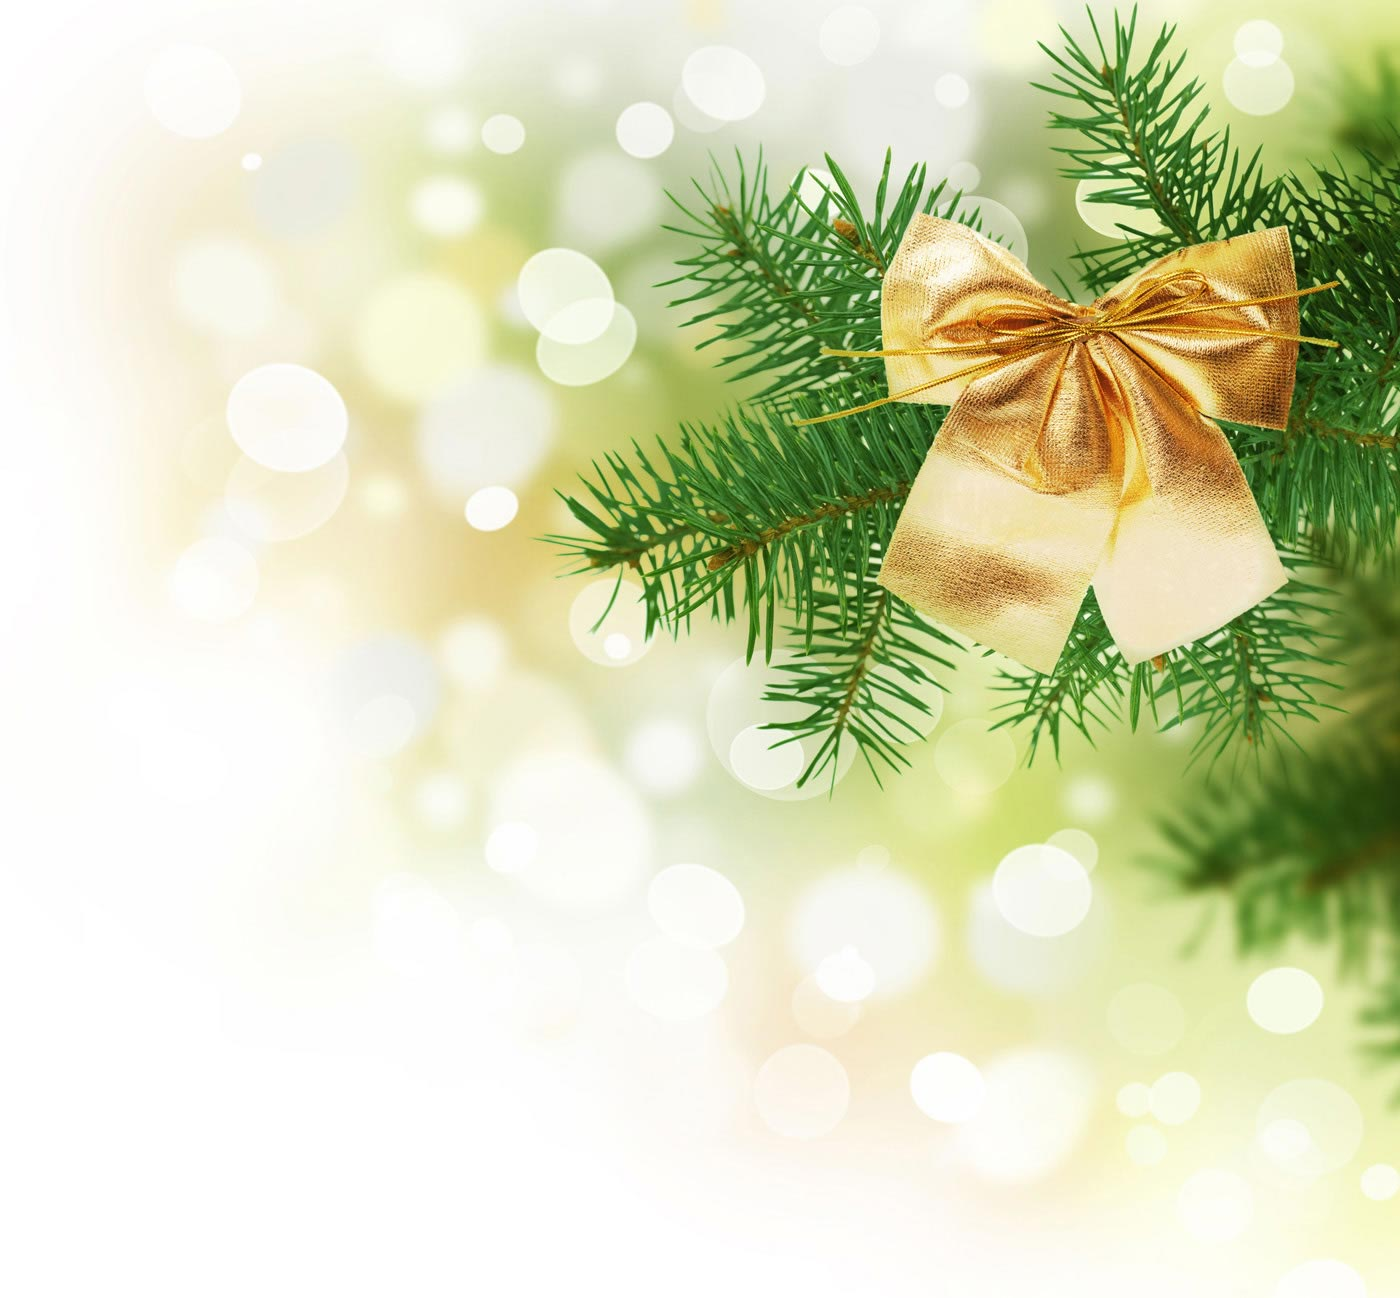 Sfondi Natale - Sfondo Desktop di Natale